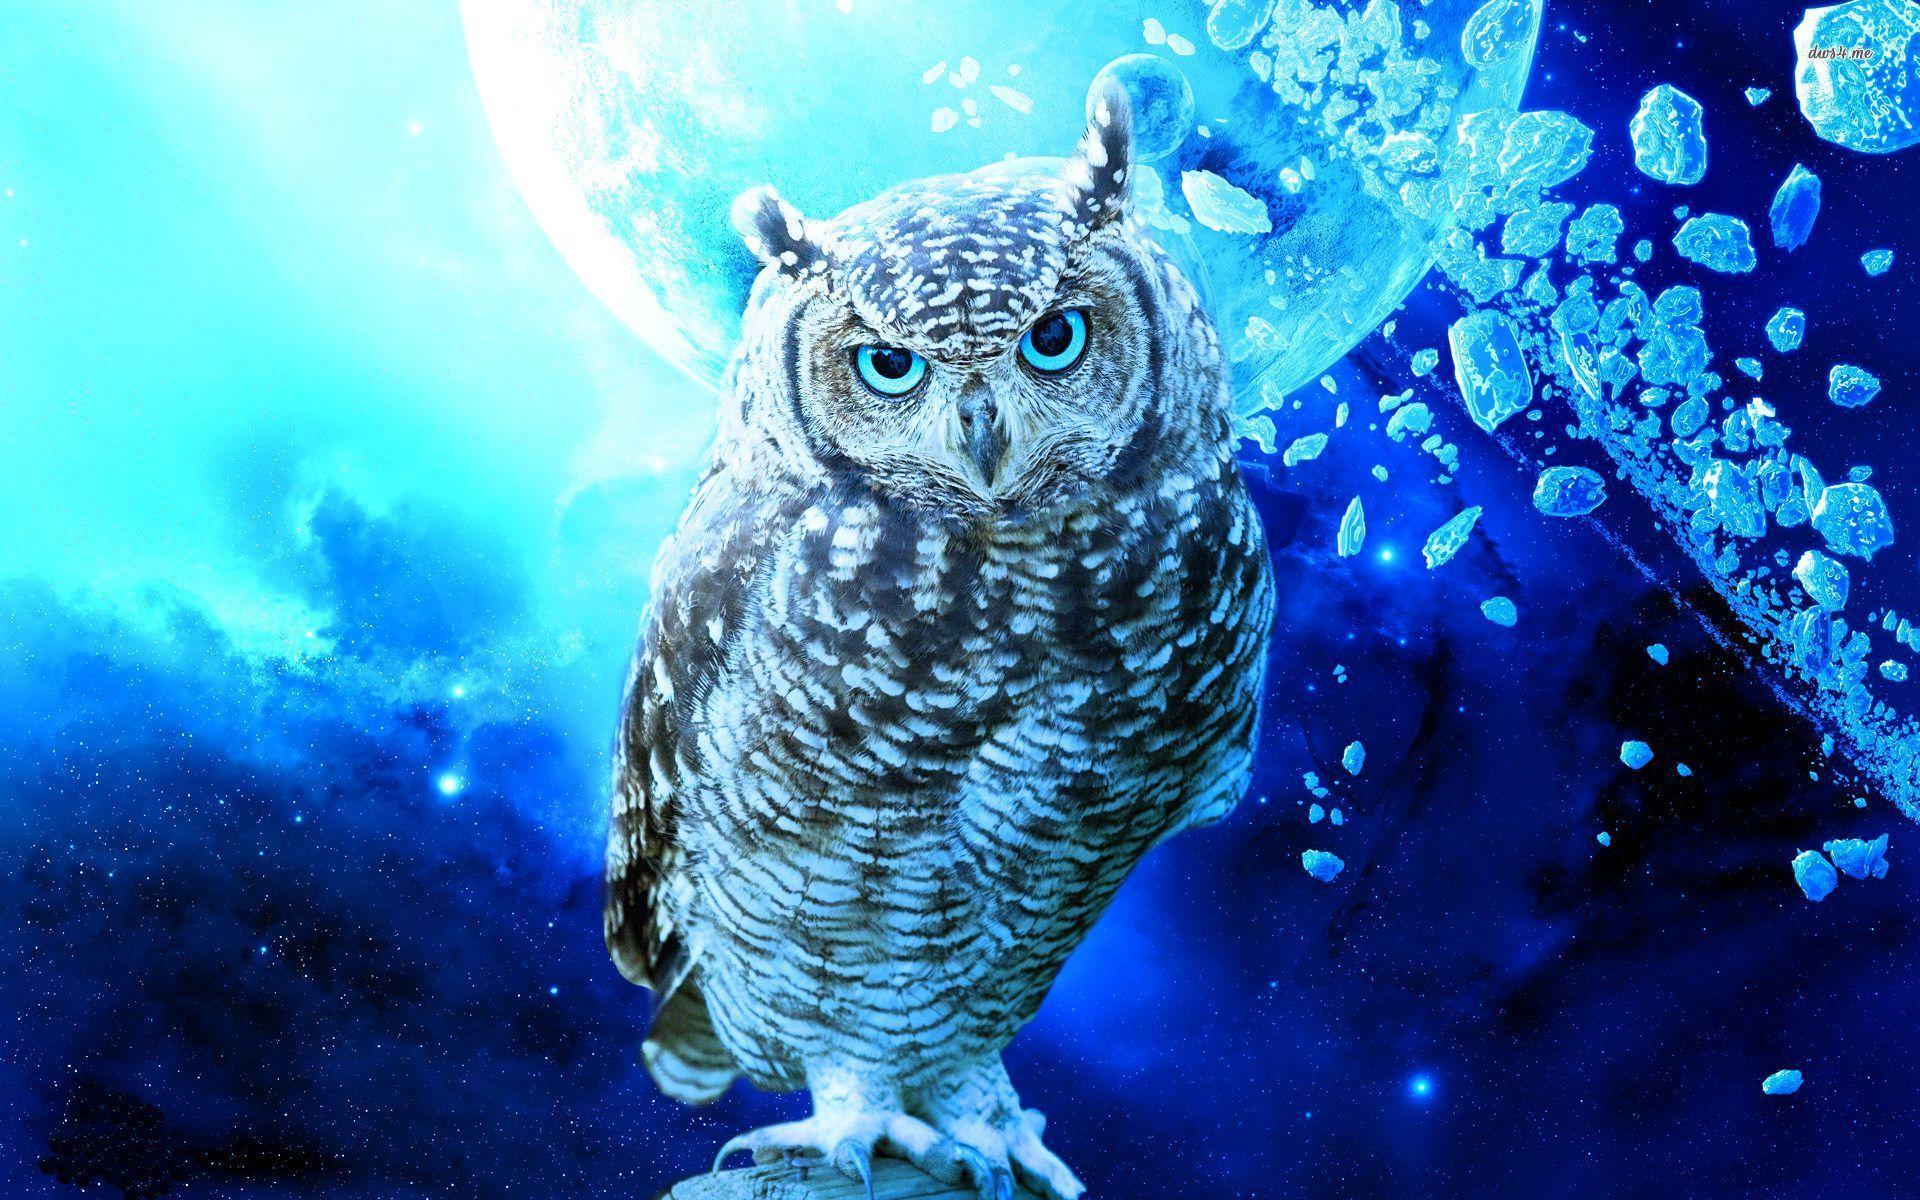 Cool Owl Wallpapers - WallpaperSafari  Cool Owl Wallpa...